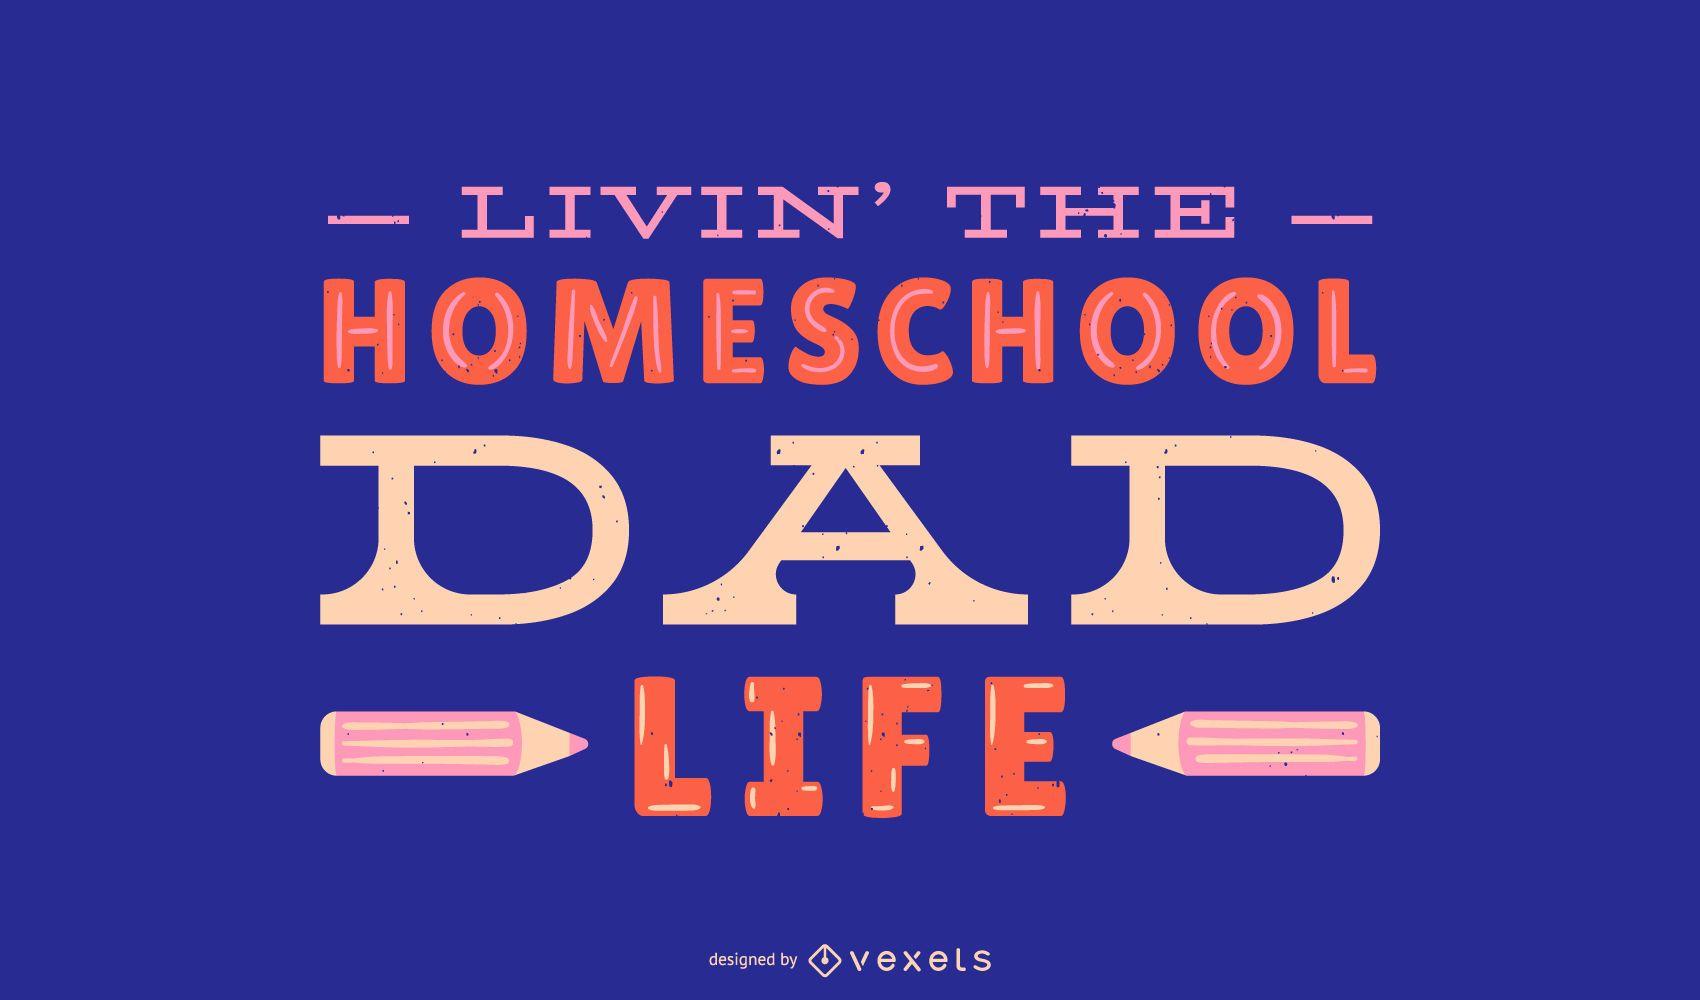 Homeschool dad life lettering design